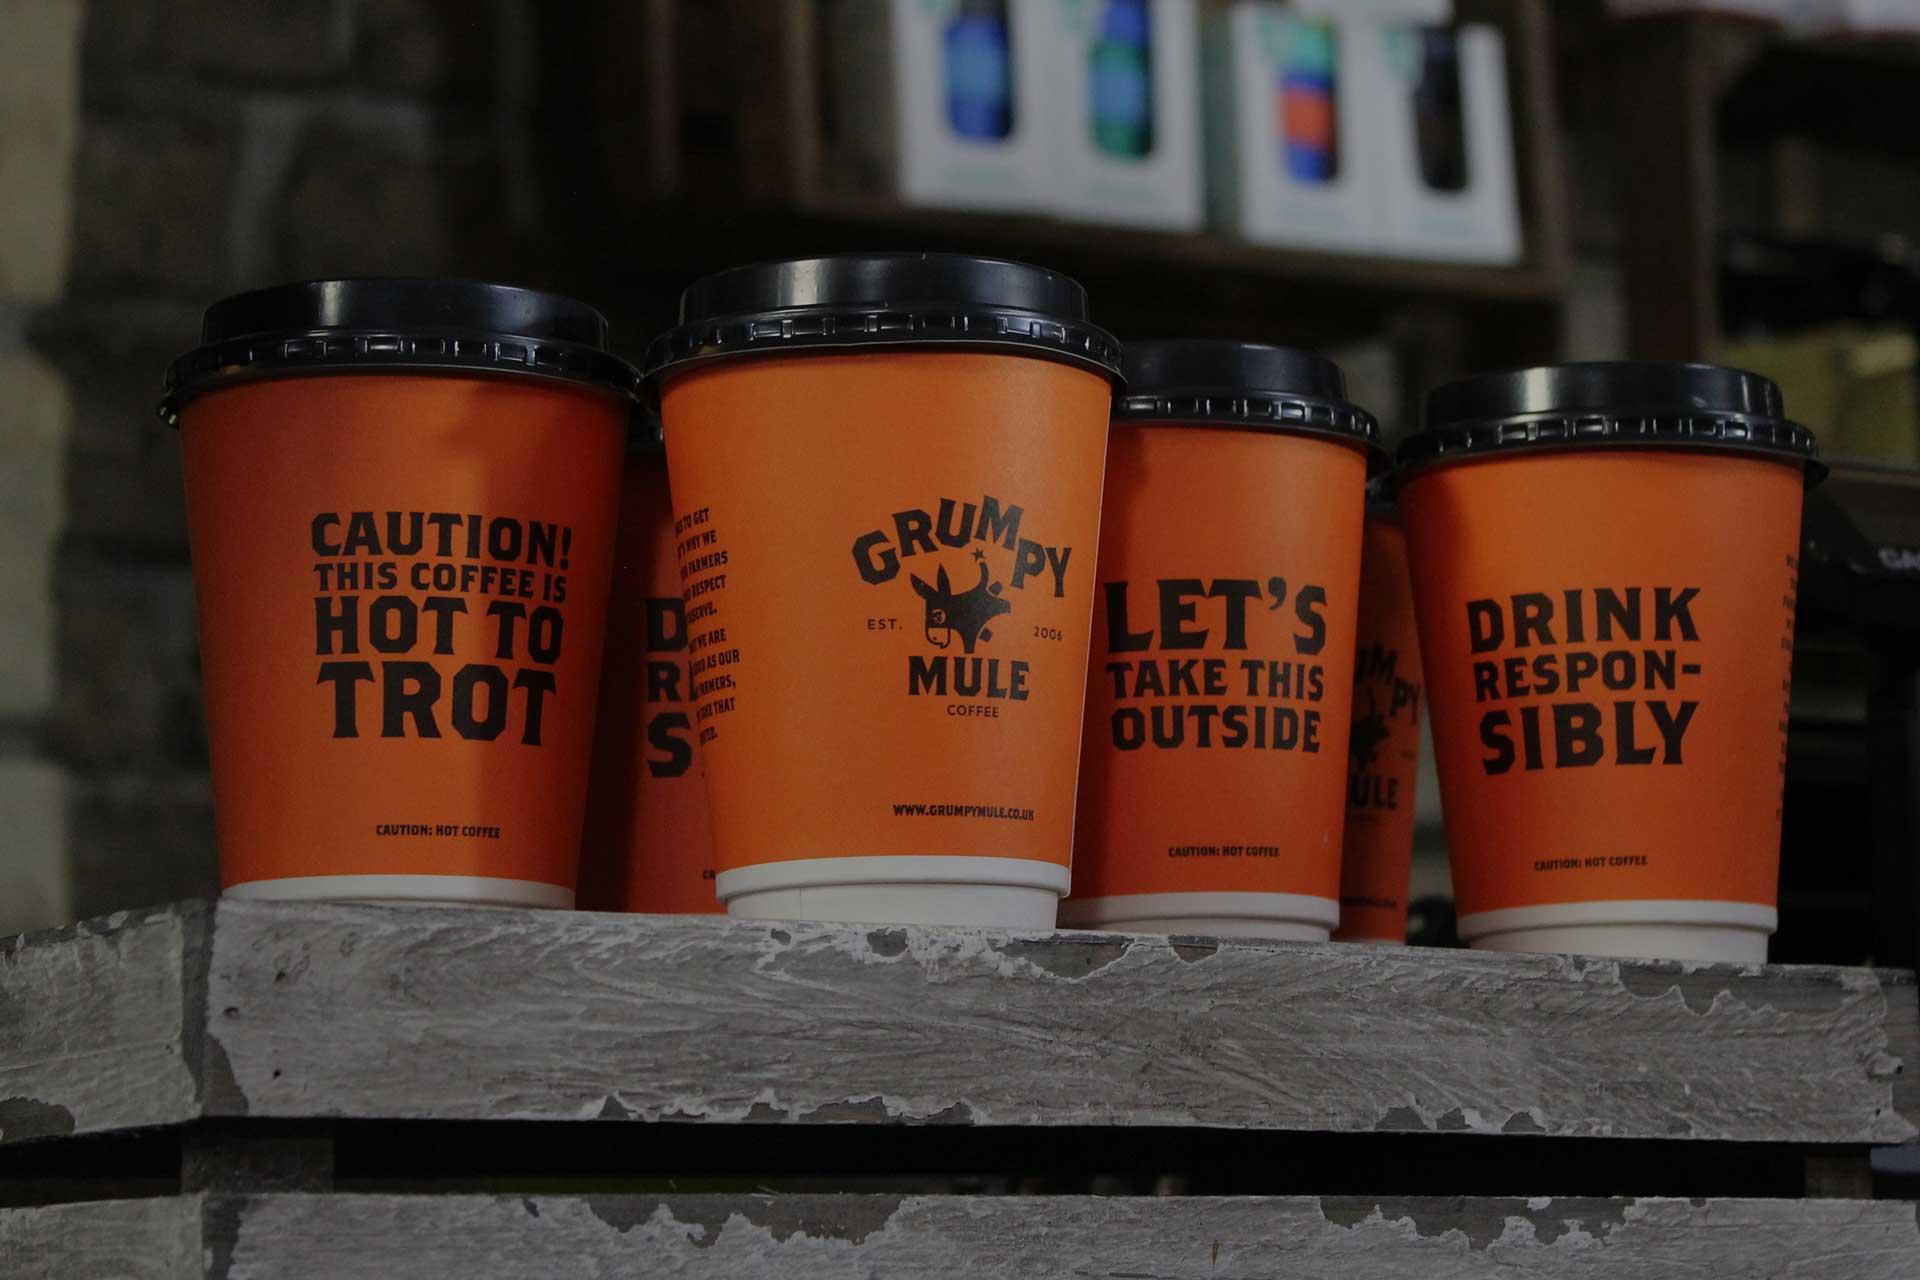 Grumpy Mule cups